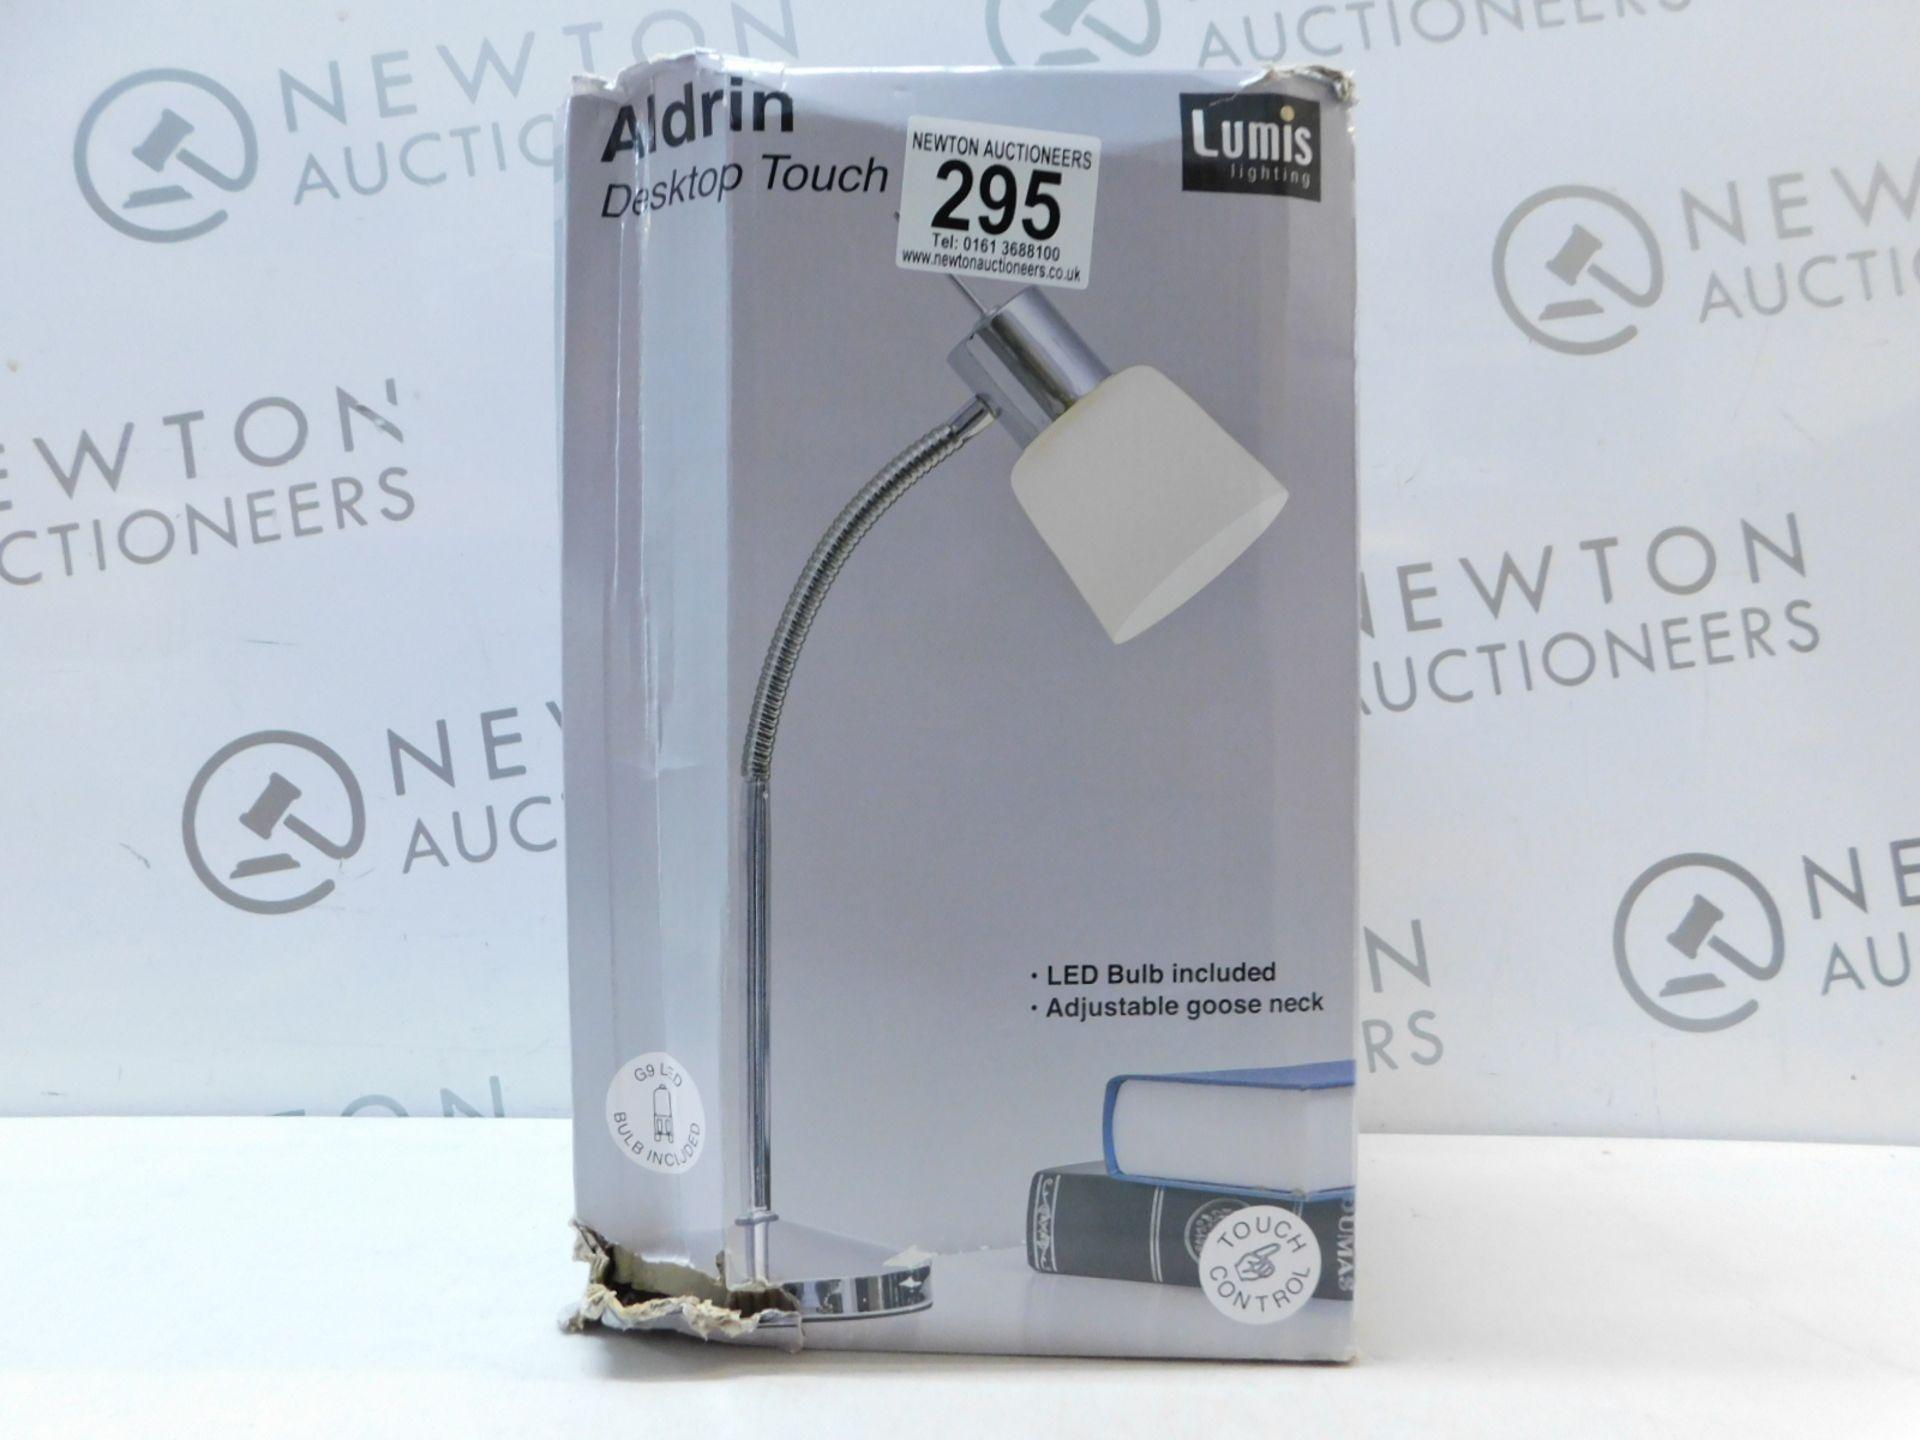 Lot 295 - 1 BOXED LUMIS LIGHTING ALDRIN DESKTOP TOUCH LIGHT RRP £29.99